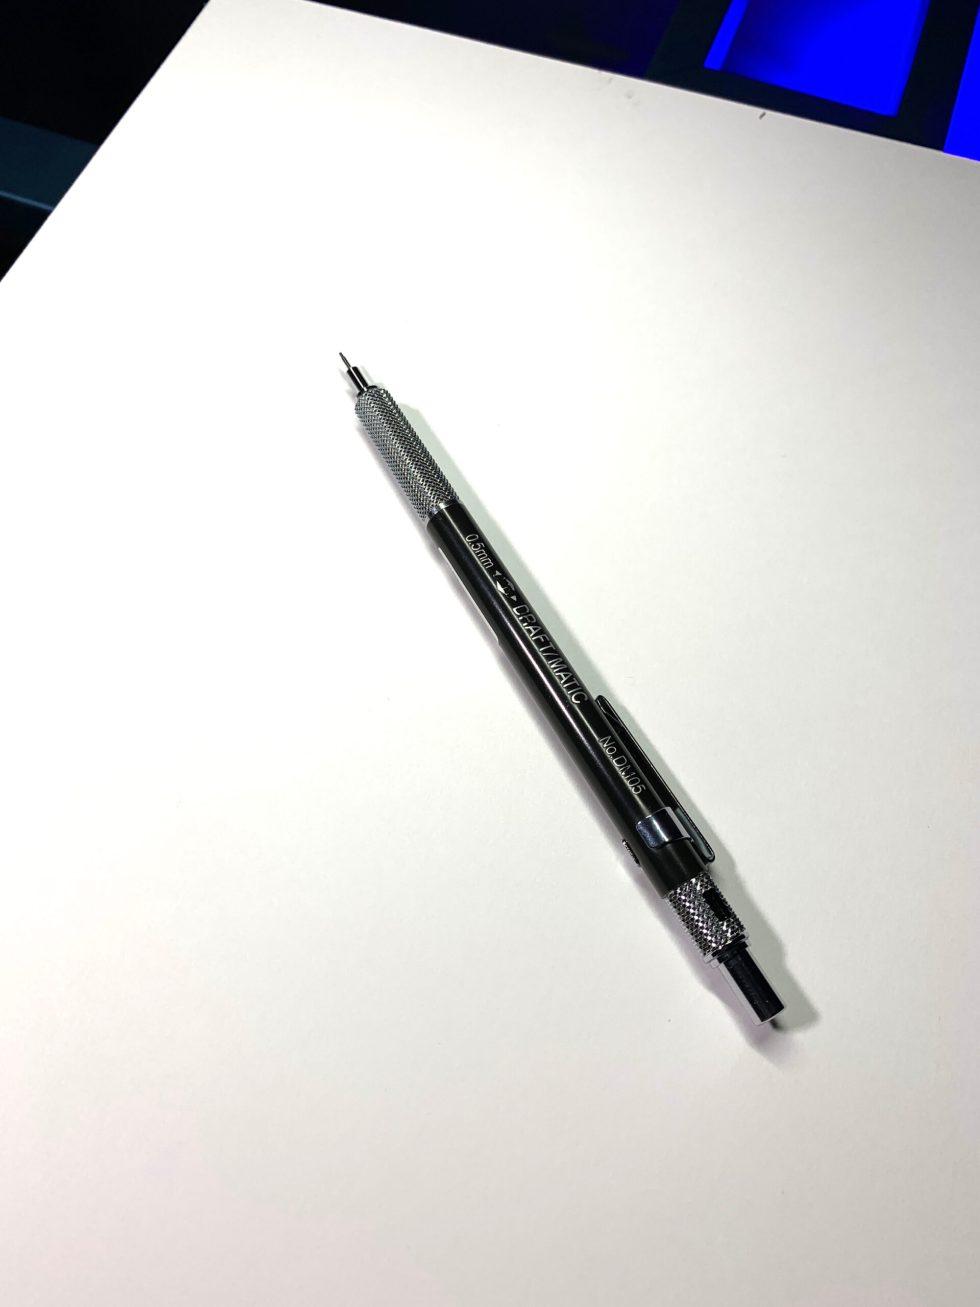 Alvin DraftMatic .5mm Pencil Image 2